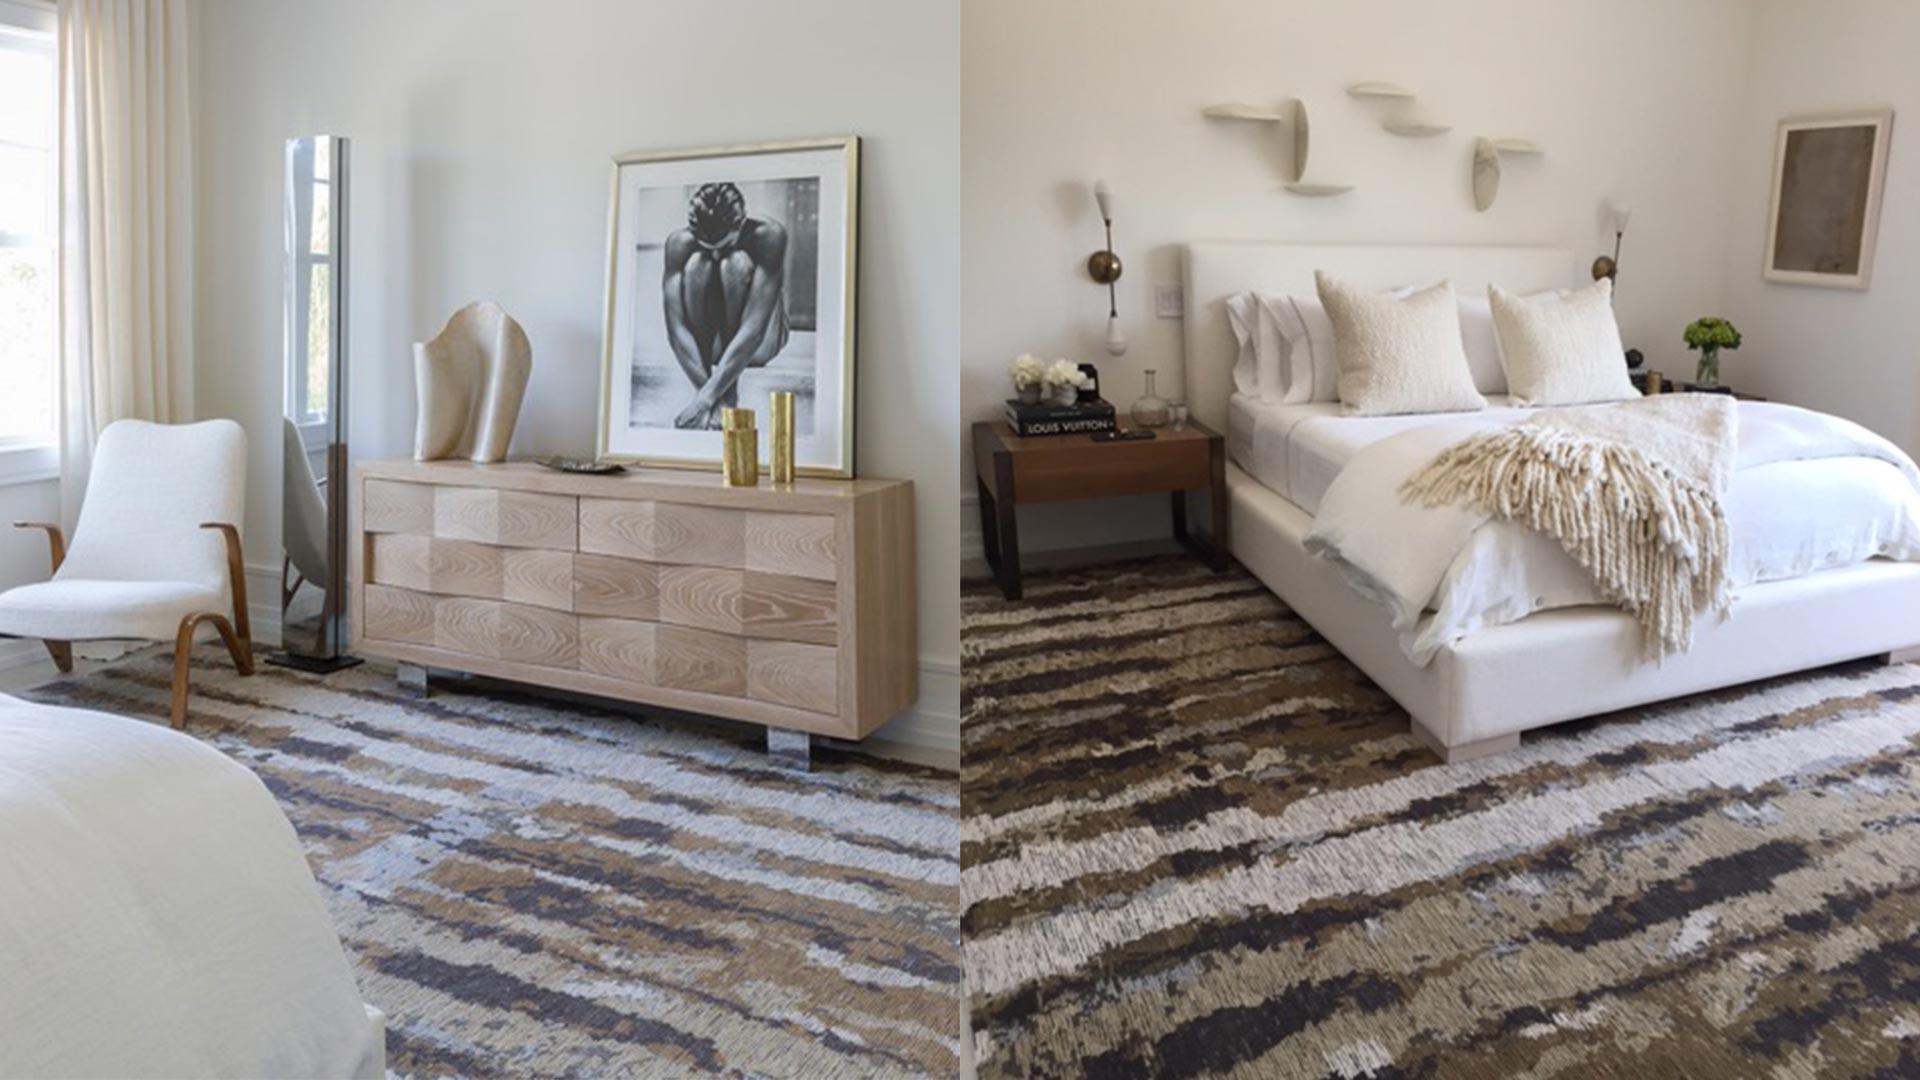 House Bedroom By Marie Christine Mcnally R100028 By Doris